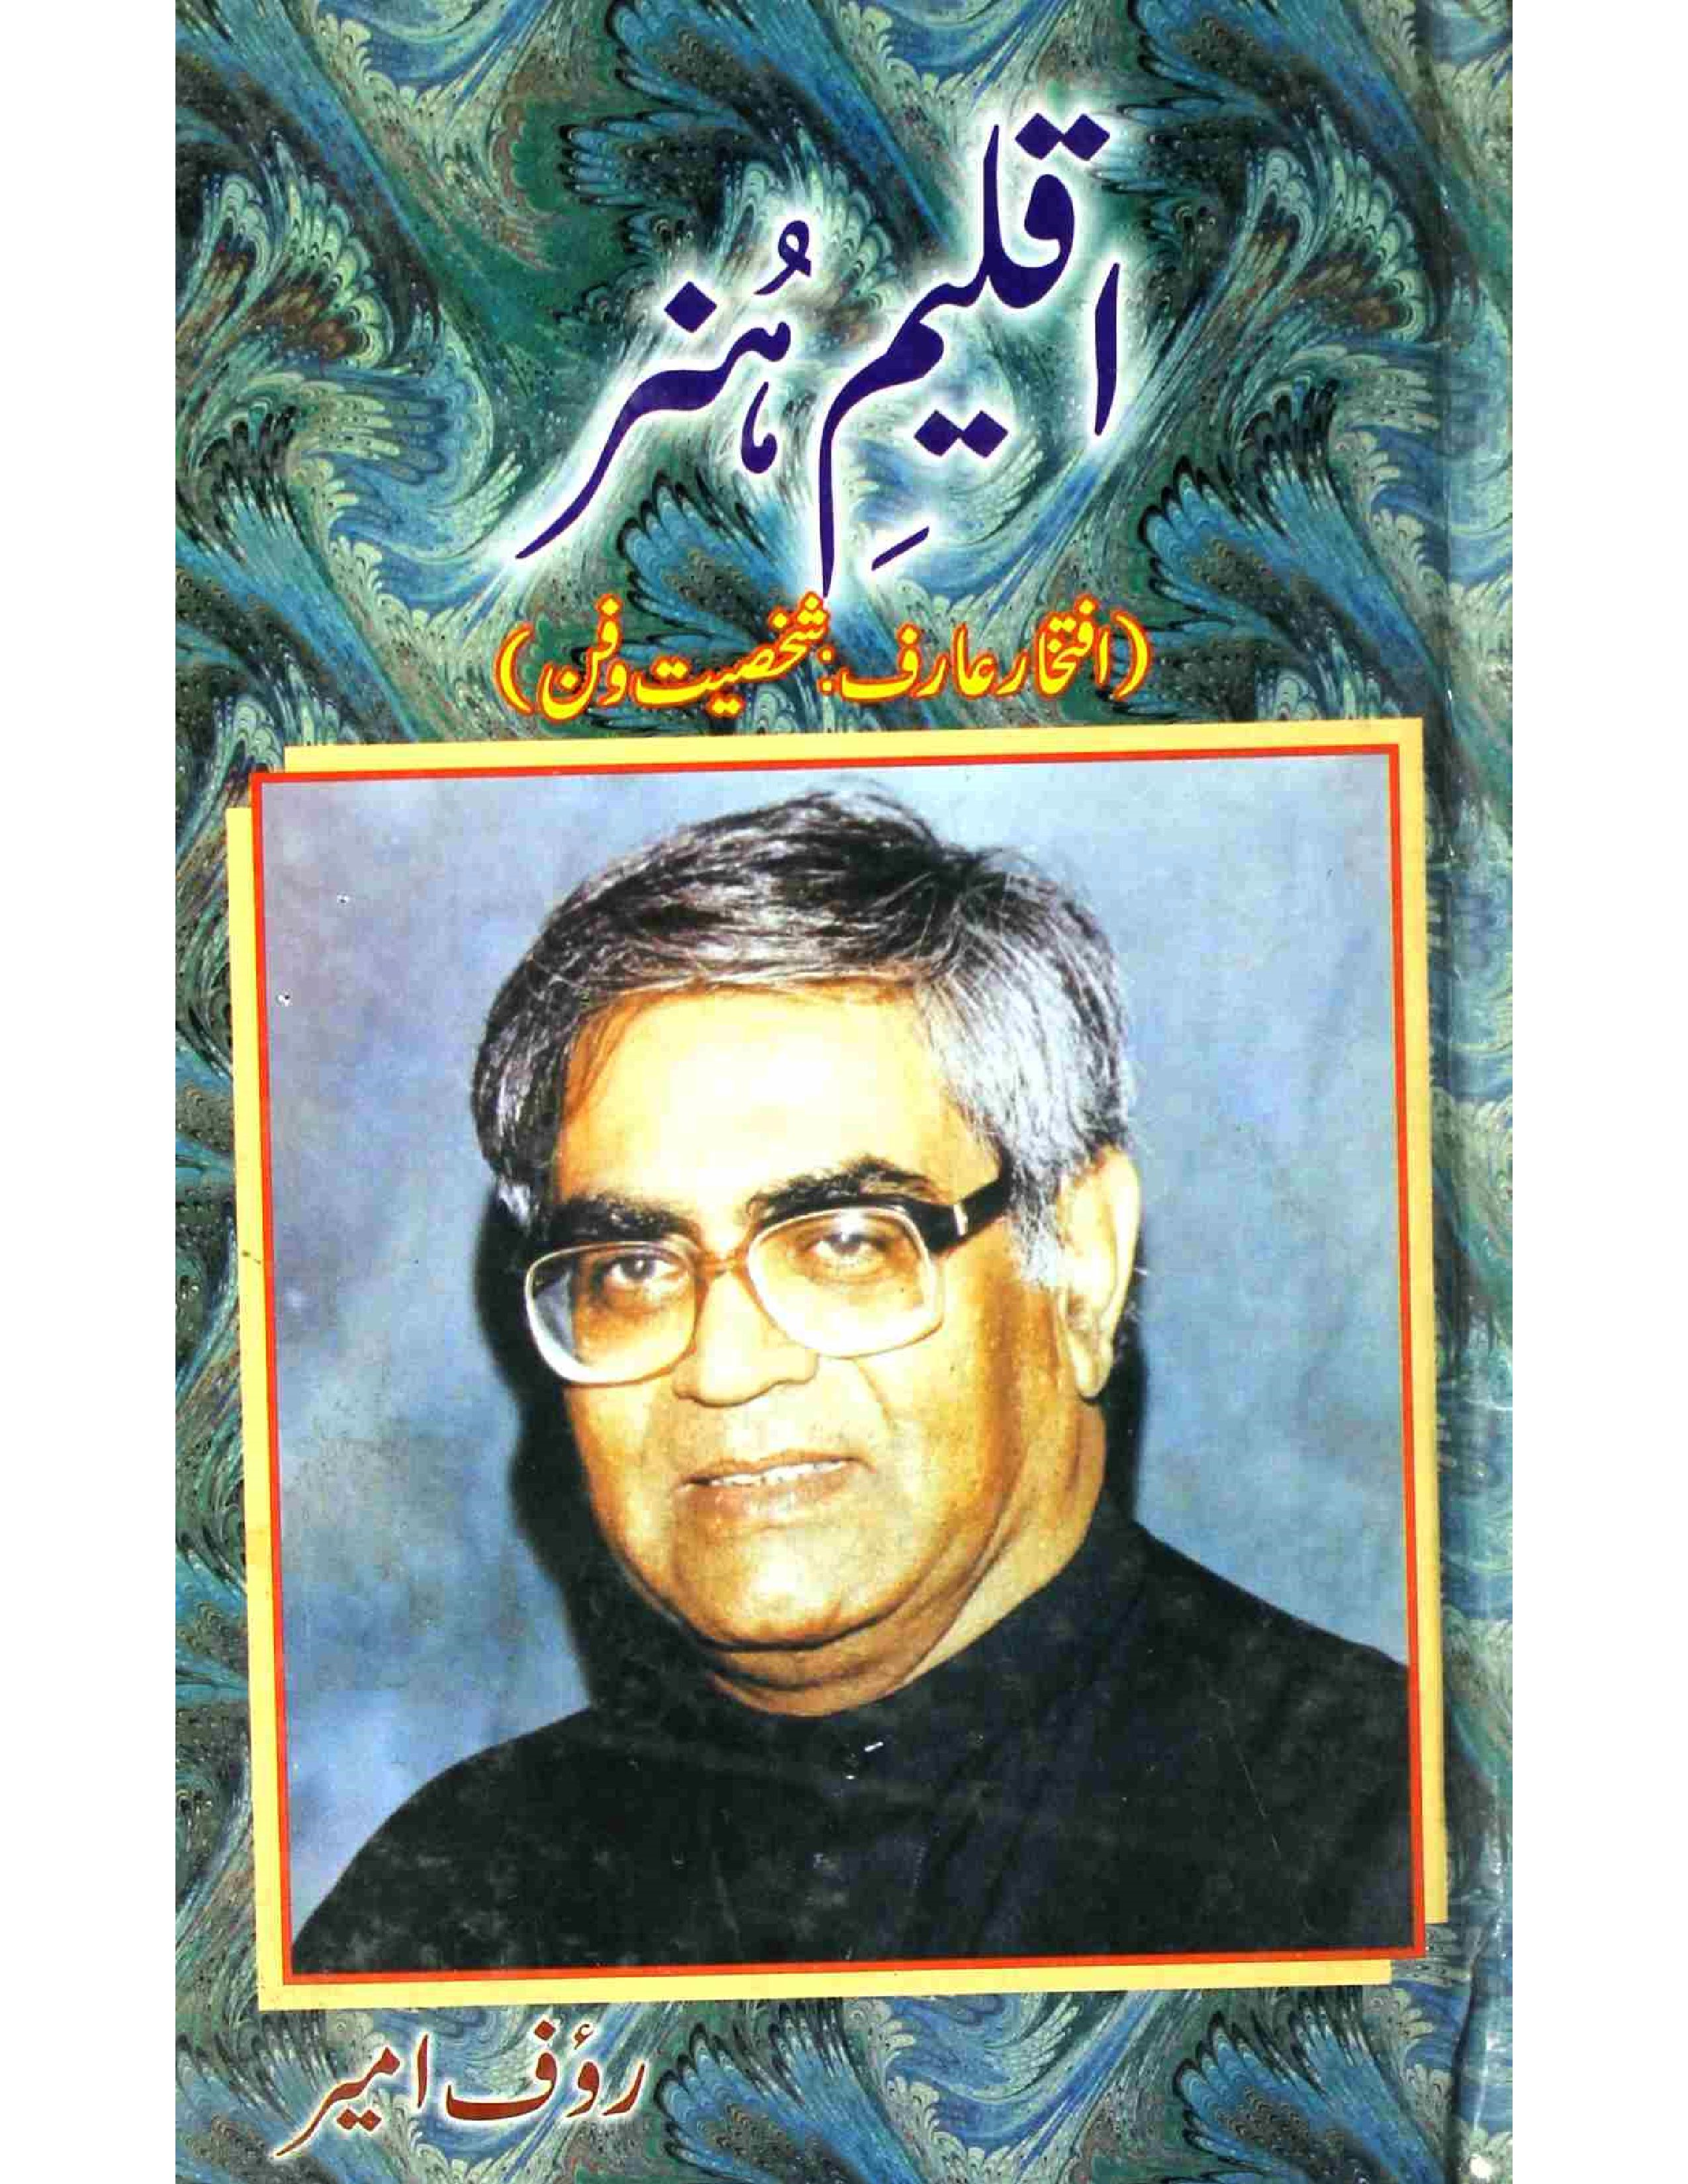 Aqleem-e-Hunar     Iftikhar Aarif: Shakhsiyat-o-Fann